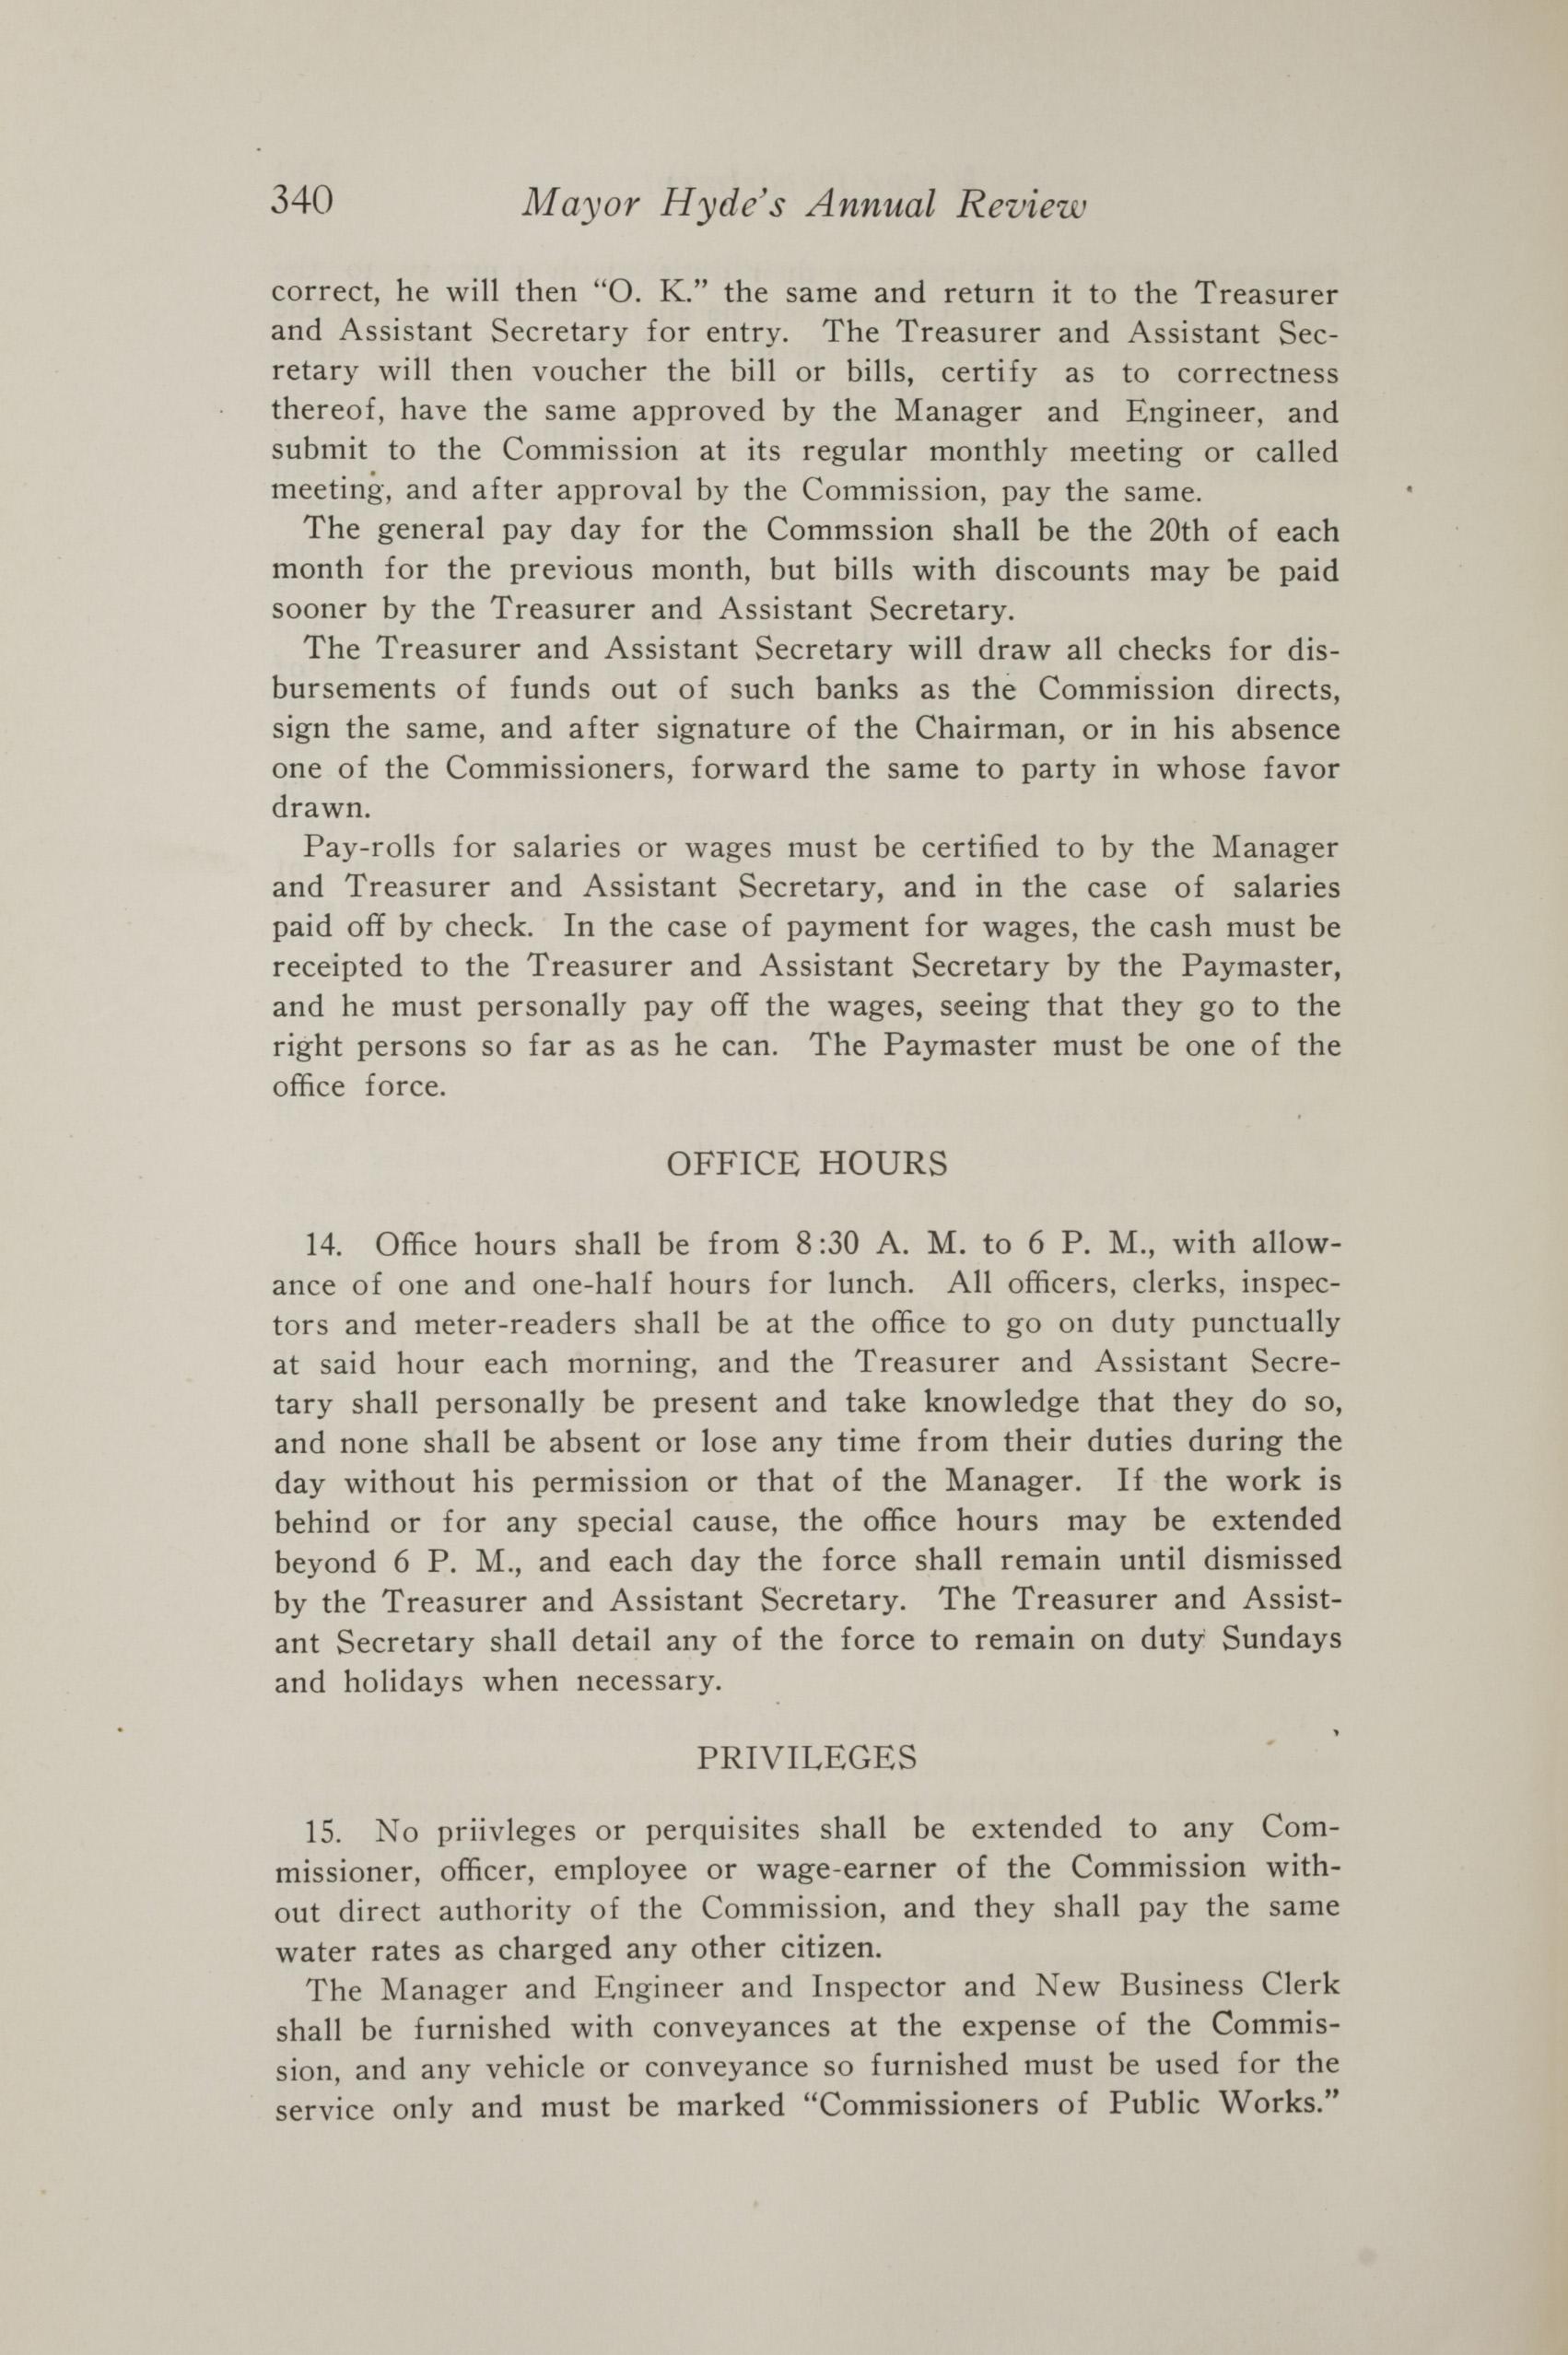 Charleston Yearbook, 1917, page 340